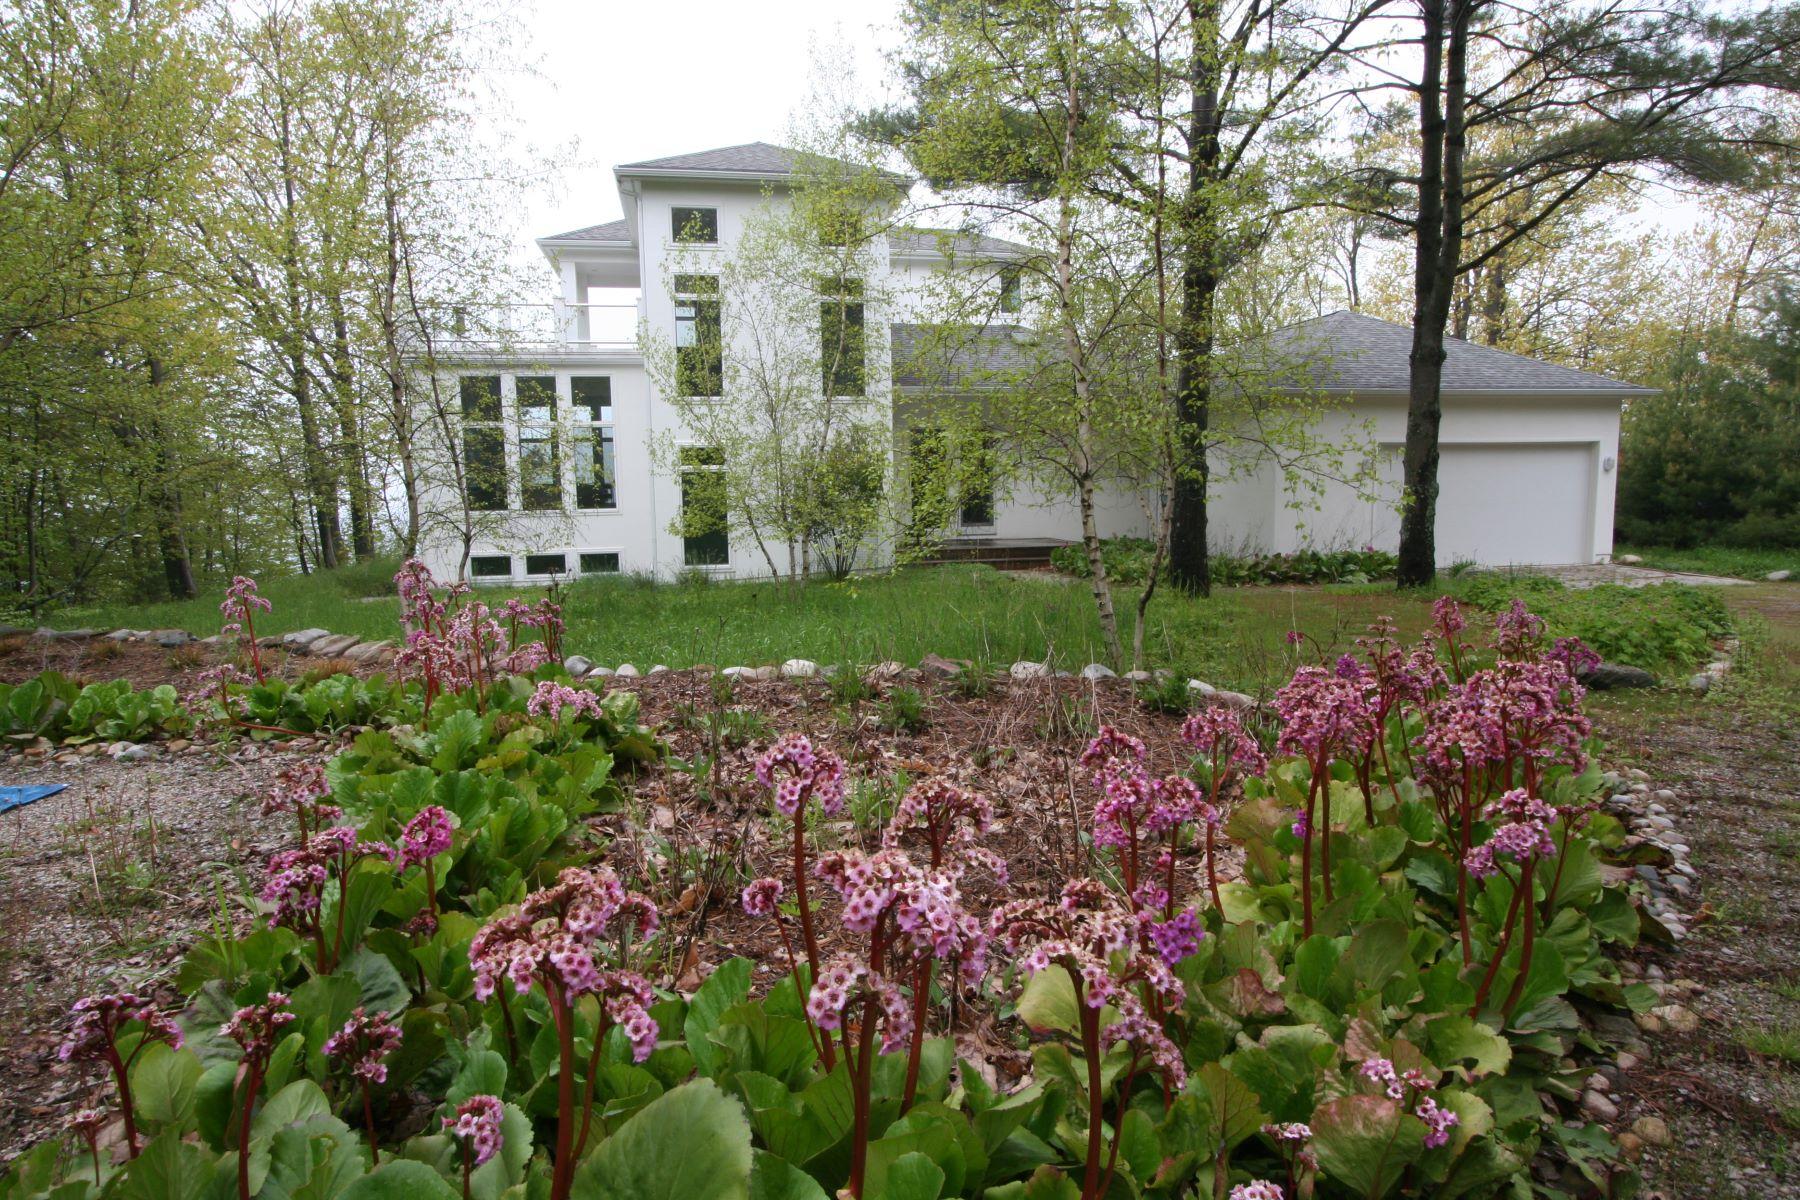 Single Family Homes for Sale at Harbor Springs, Michigan 3485 N. Lake Shore Drive Good Hart, Michigan 49737 United States